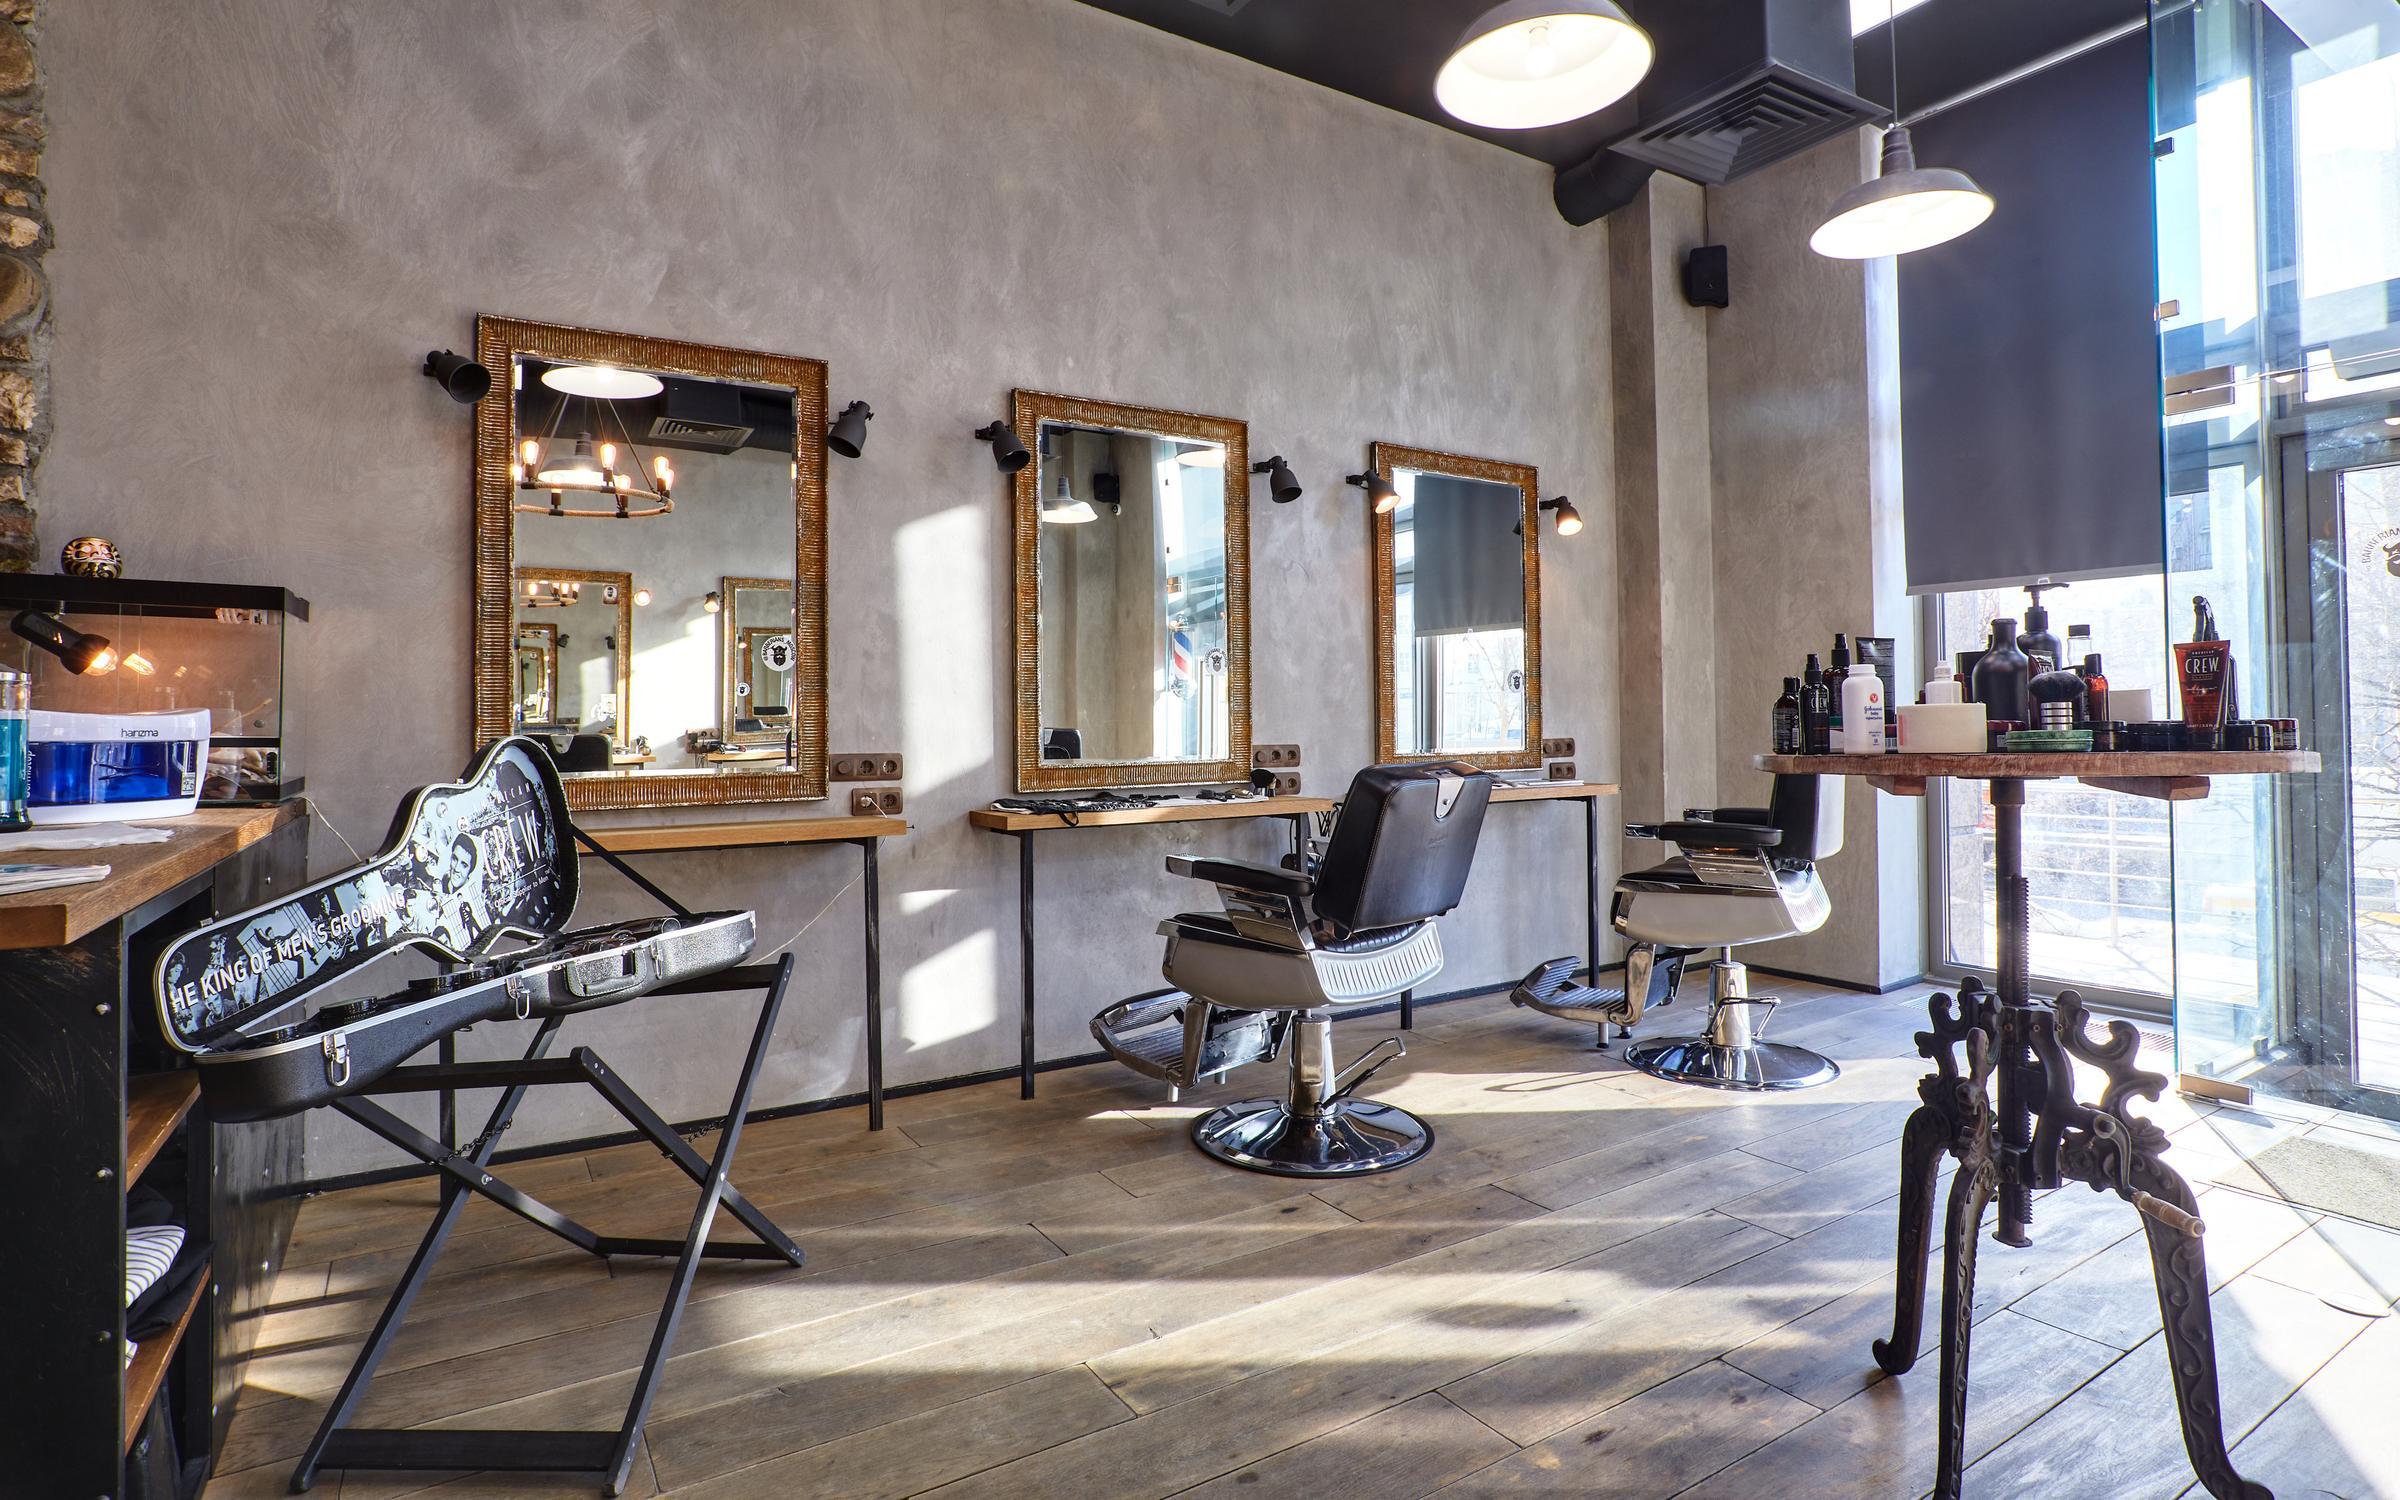 фотография Салона стрижки и бритья Barberians Moscow